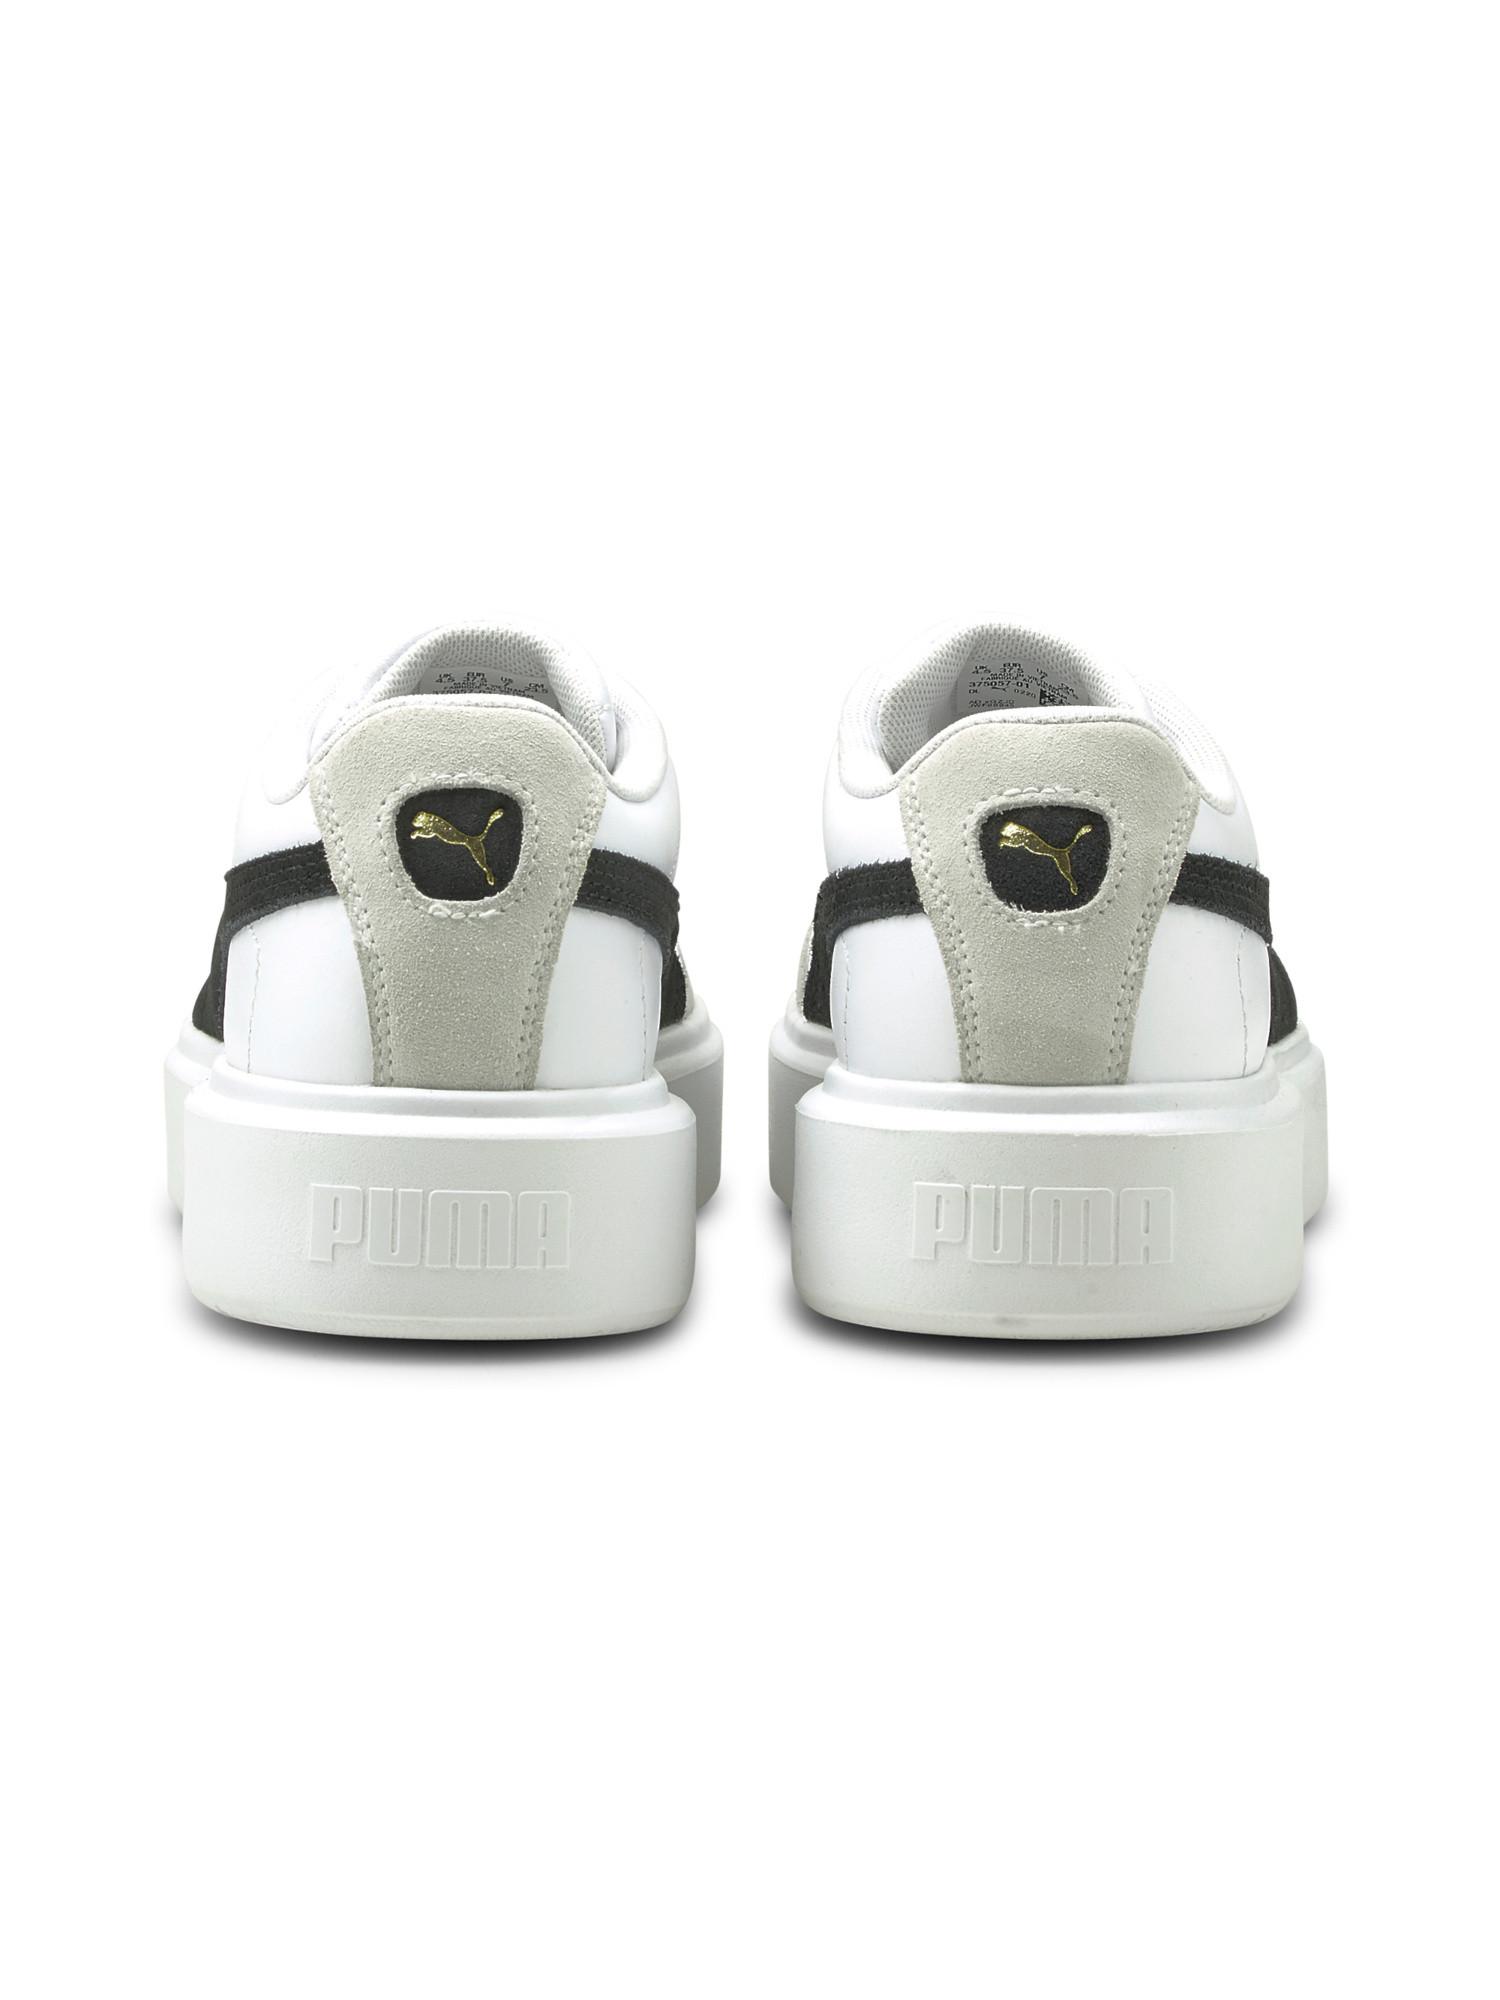 Sneakers Oslo Maya, Nero/Bianco, large image number 4